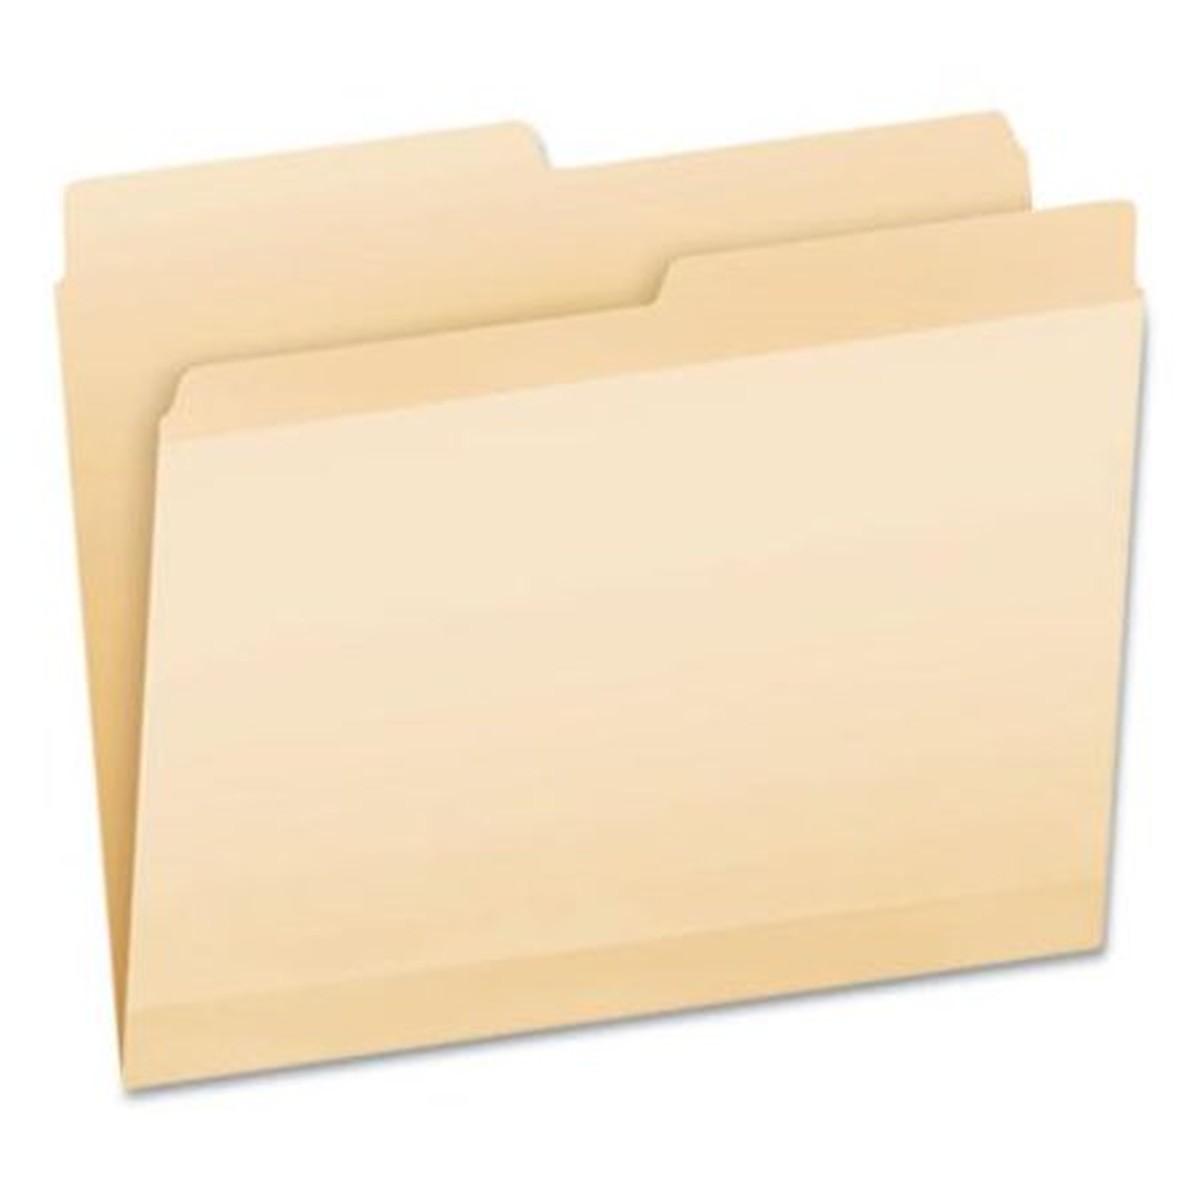 Poly Reinforced File Folder, 1/5-Cut Tabs, Letter Size, Manila, 24/Pack